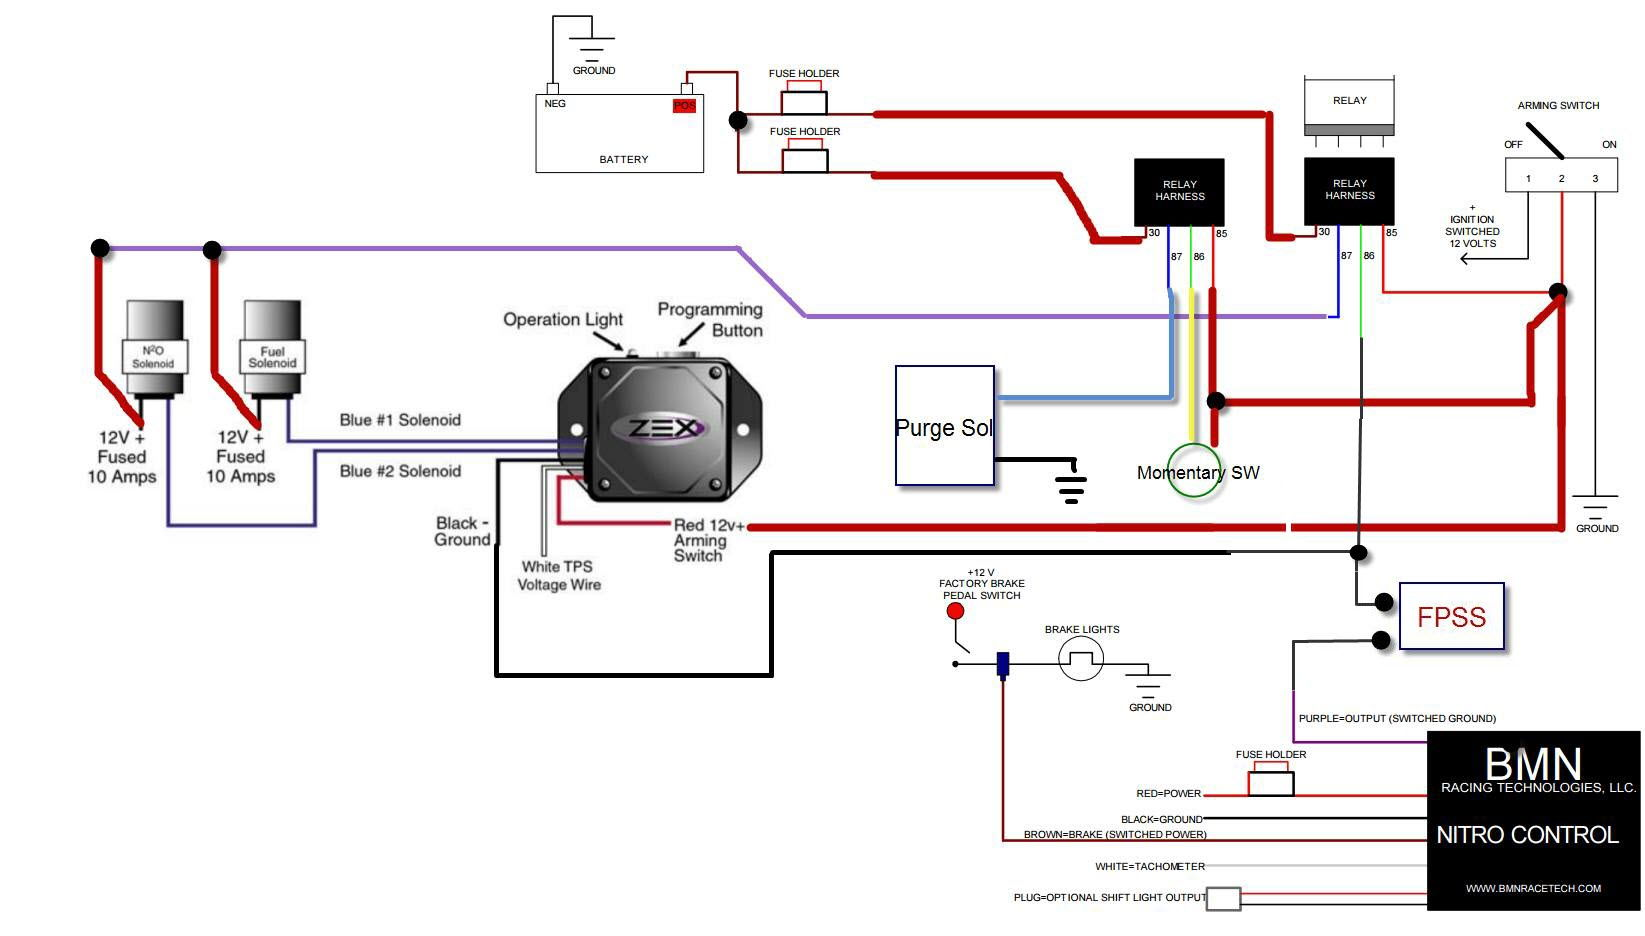 Nitrous Window Switch Wiring On 2 Stage Nitrous On Wiring Diagram